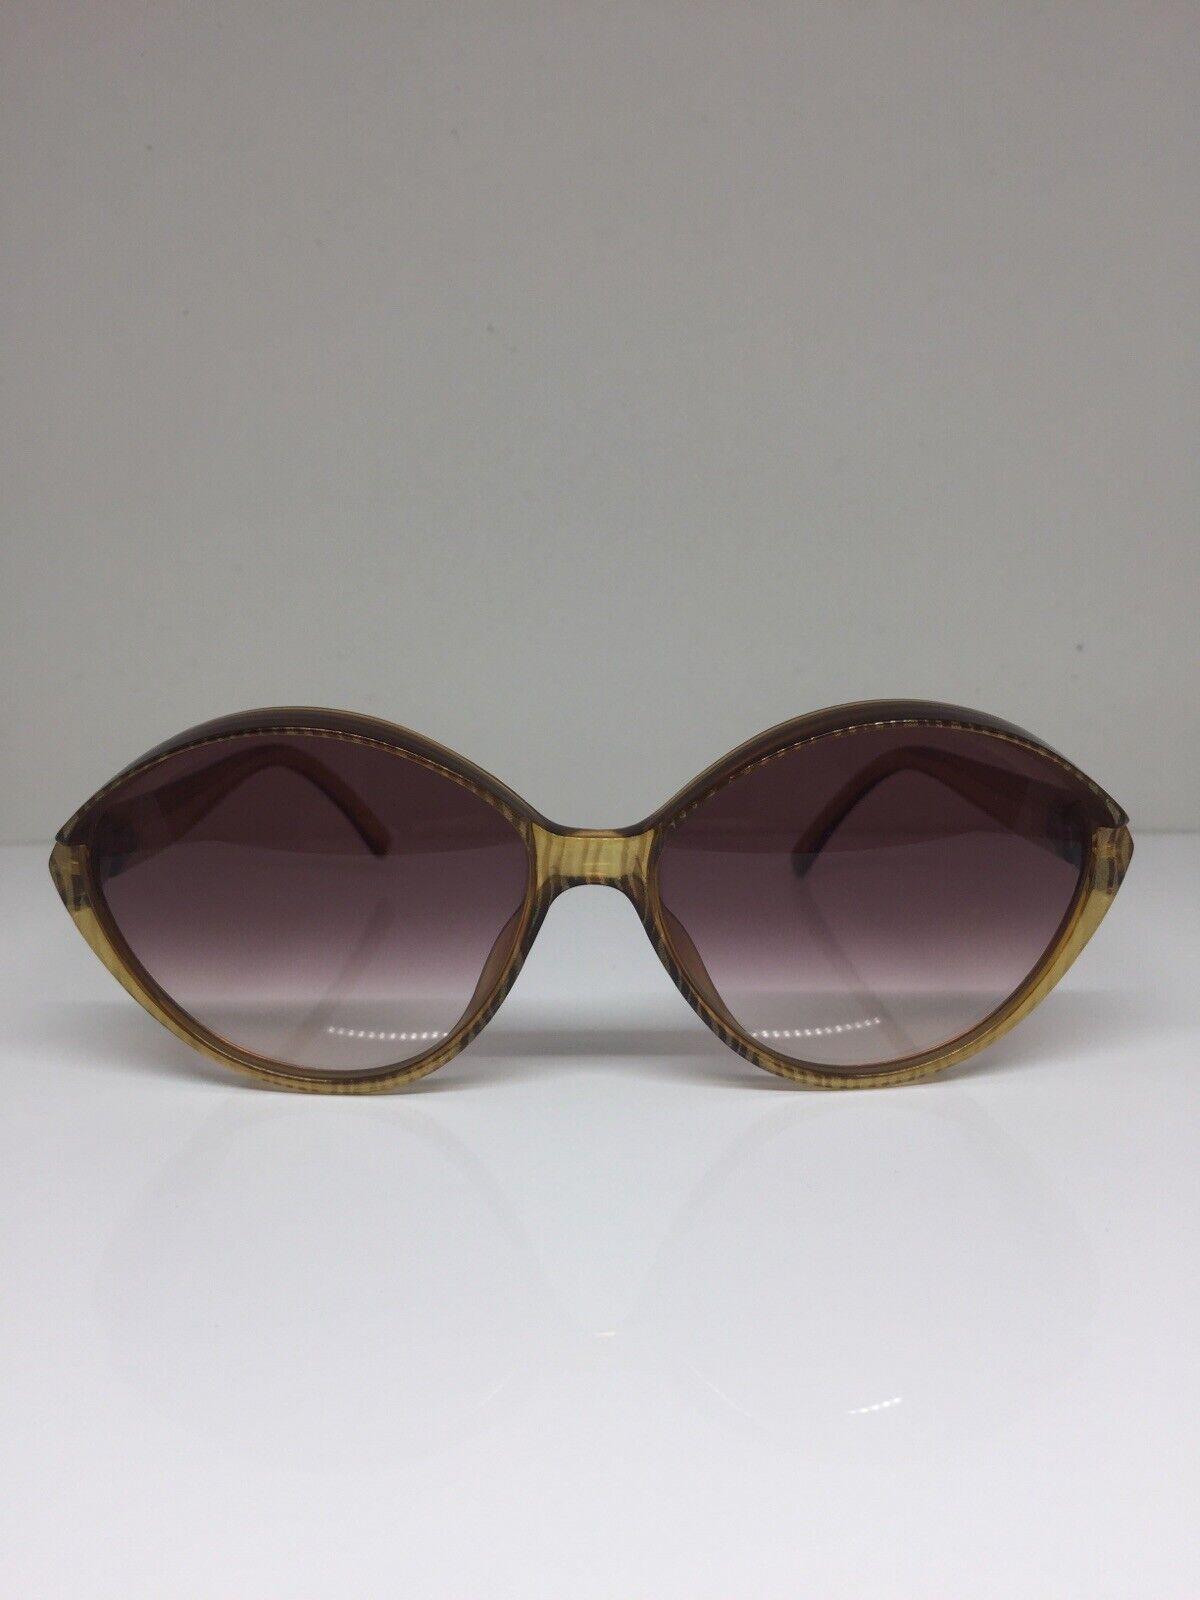 New Vintage Christian Dior CD 2180 Sunglasses C. 10 Translucent Brown Germany